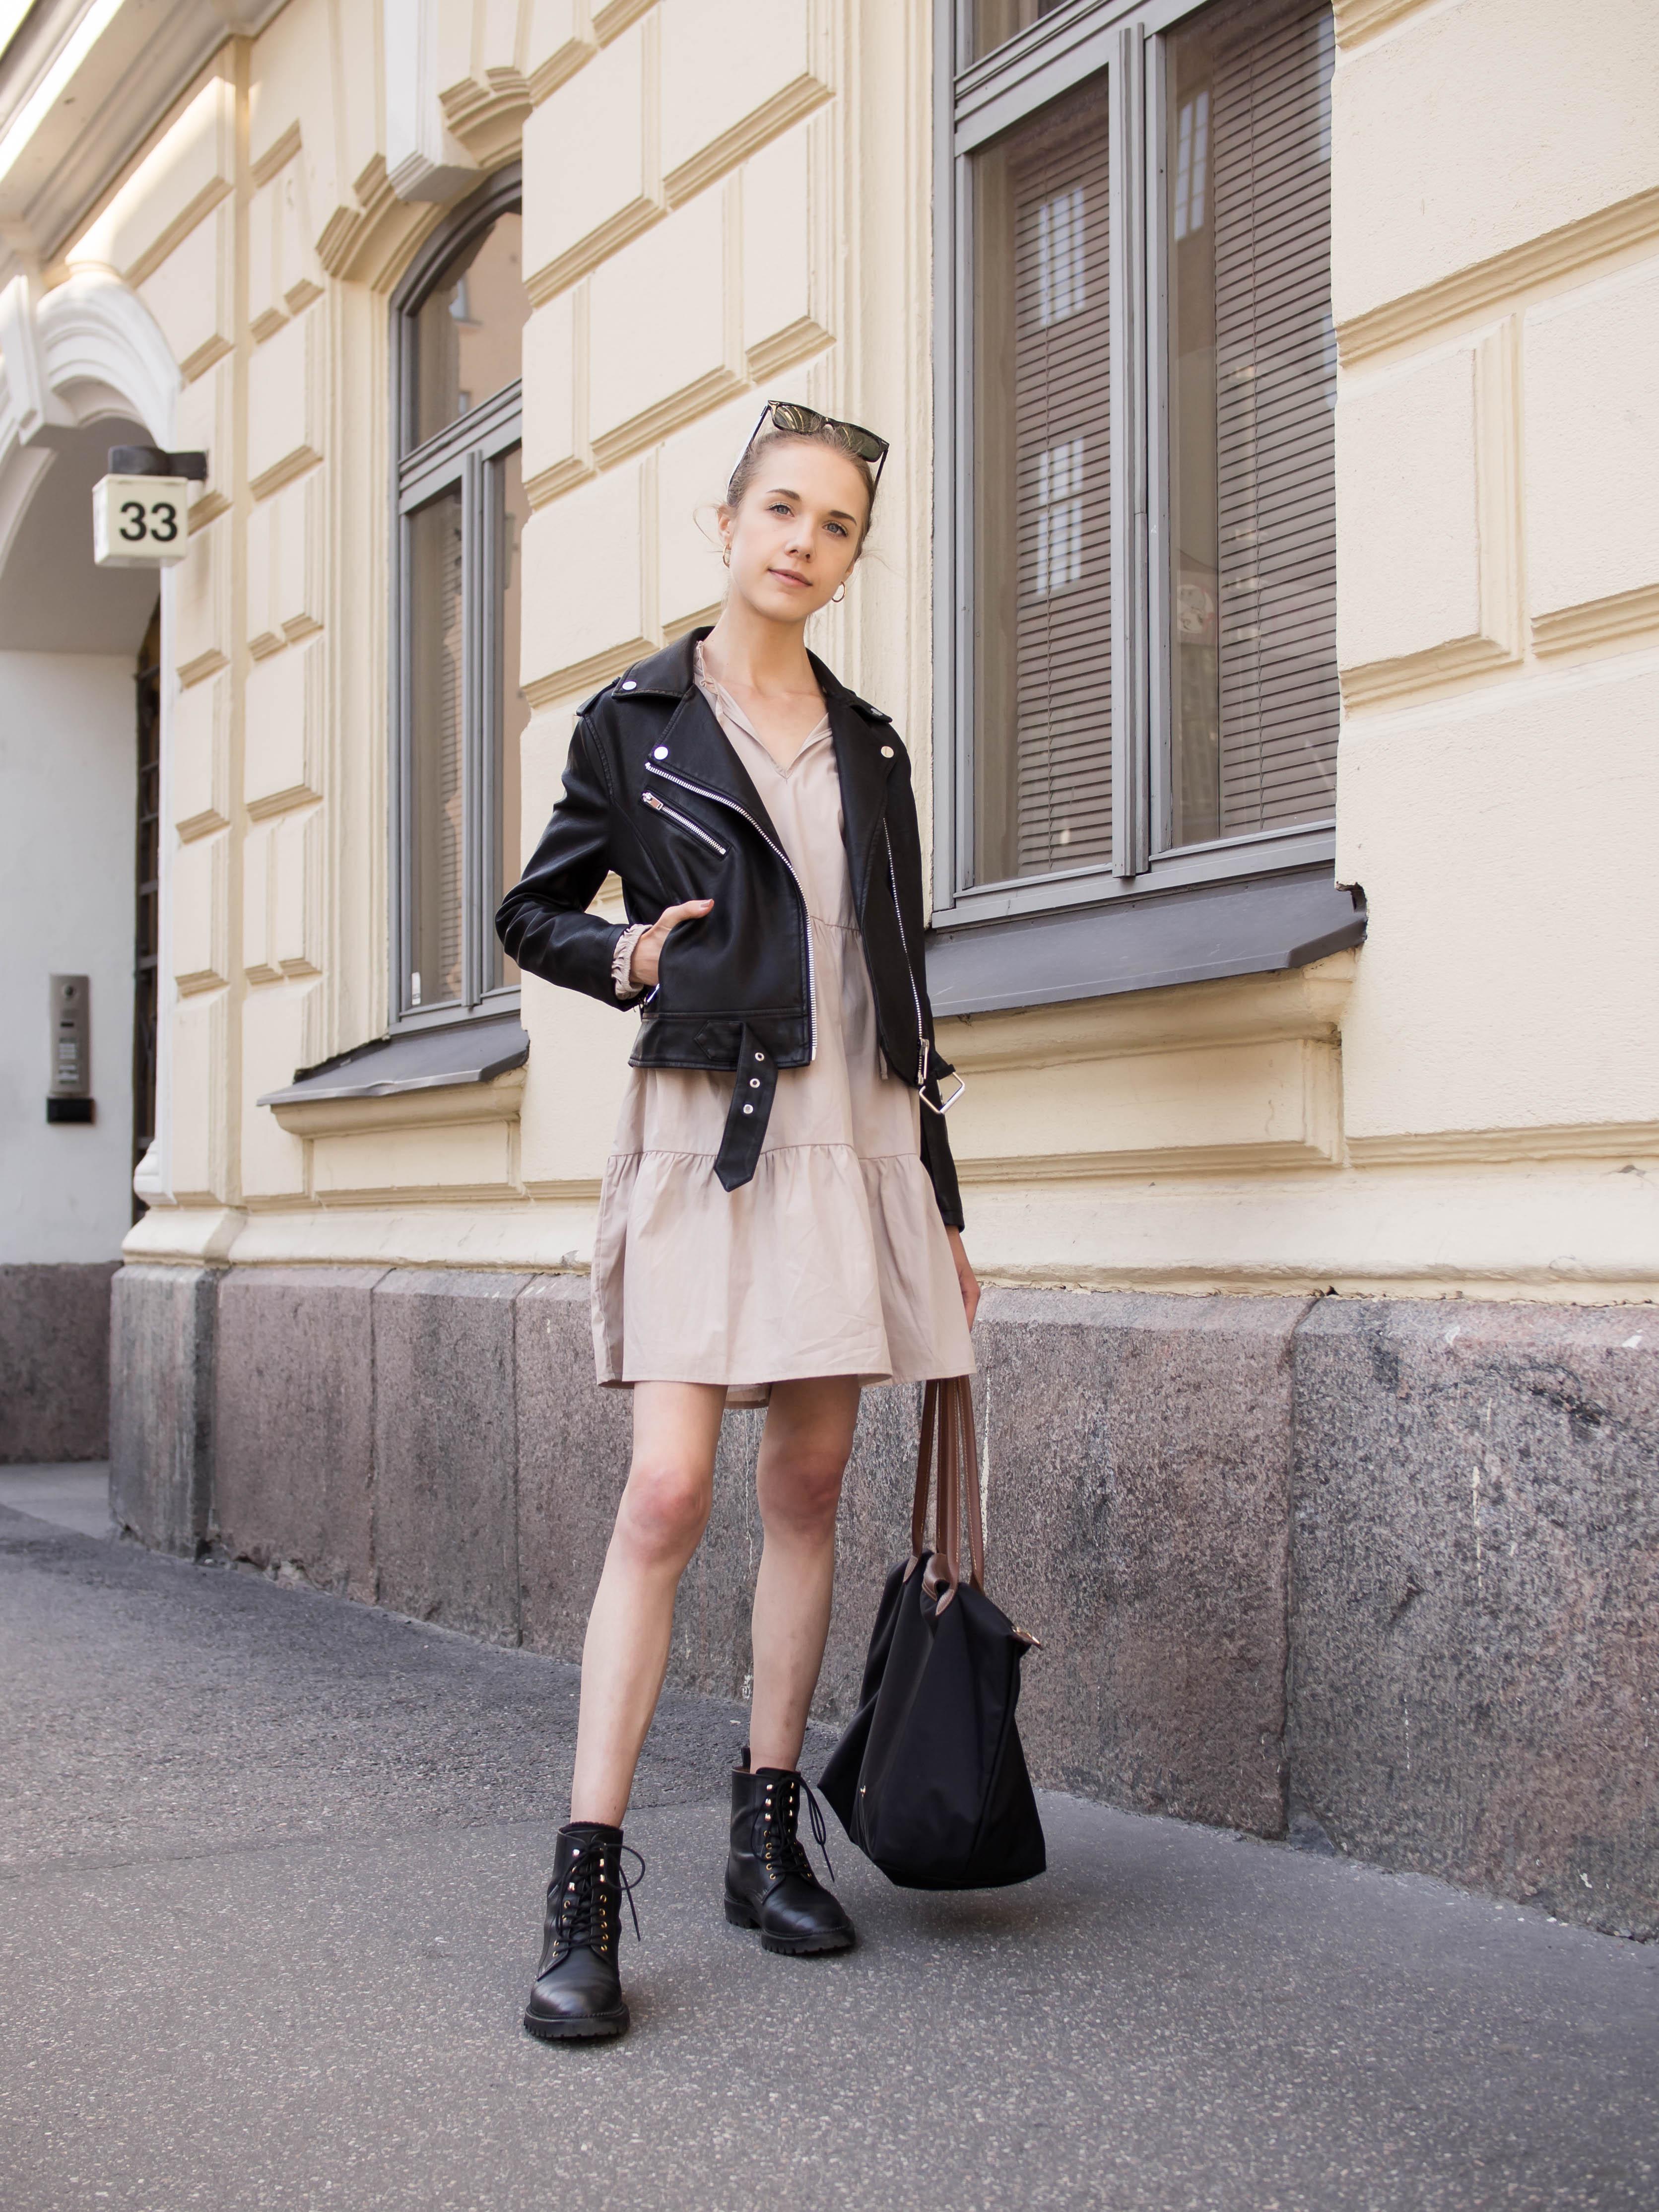 Saint Laurent inspired outfit - Saint Laurent inspiroima asu